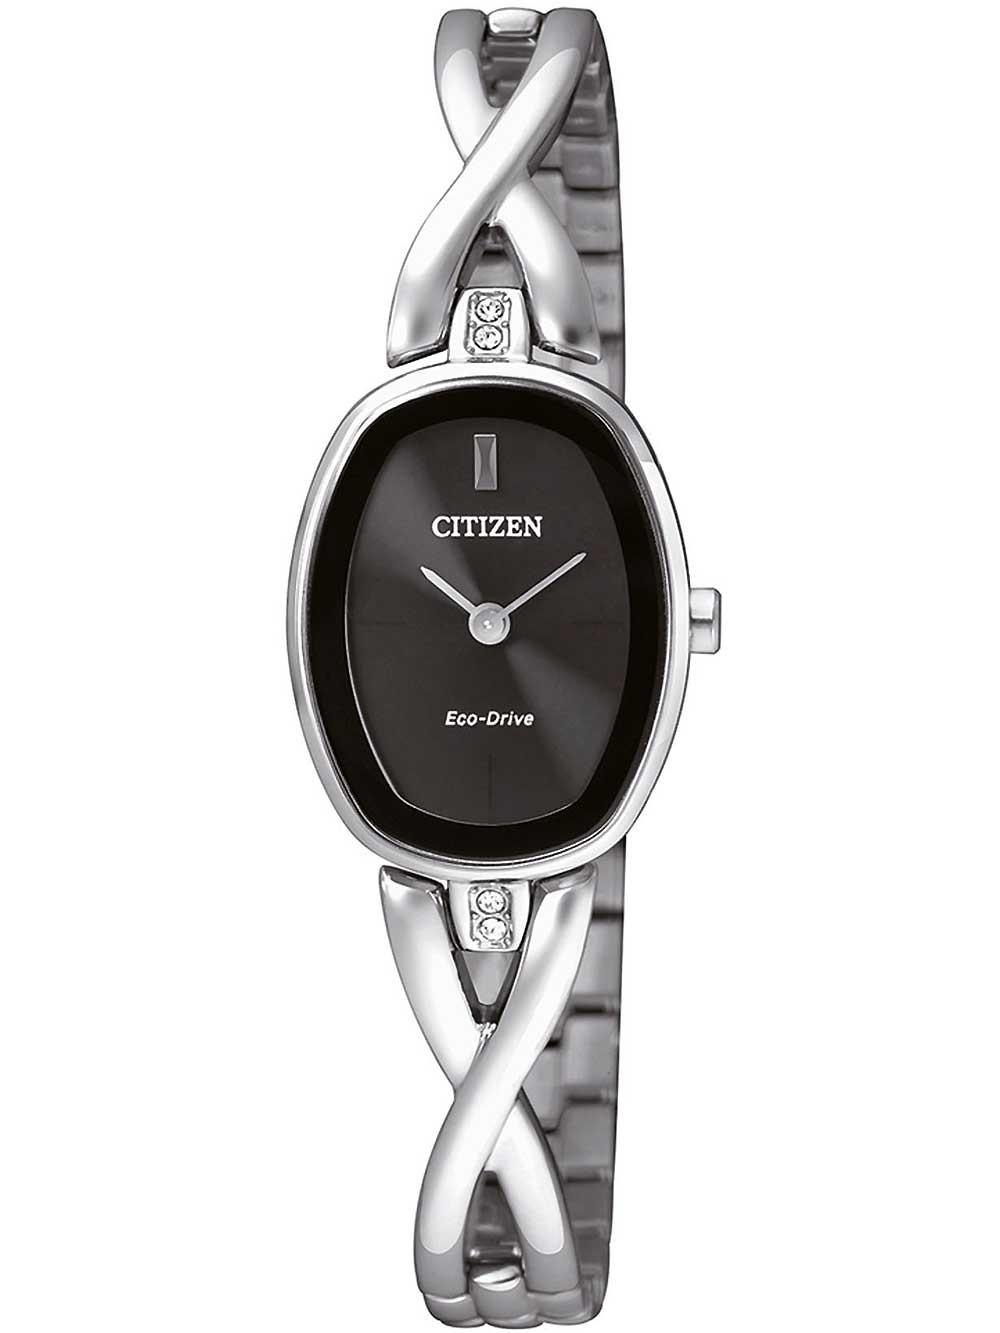 montres chrono12 citizen ex1410 88e elegant eco drive damen 18mm 3atm. Black Bedroom Furniture Sets. Home Design Ideas